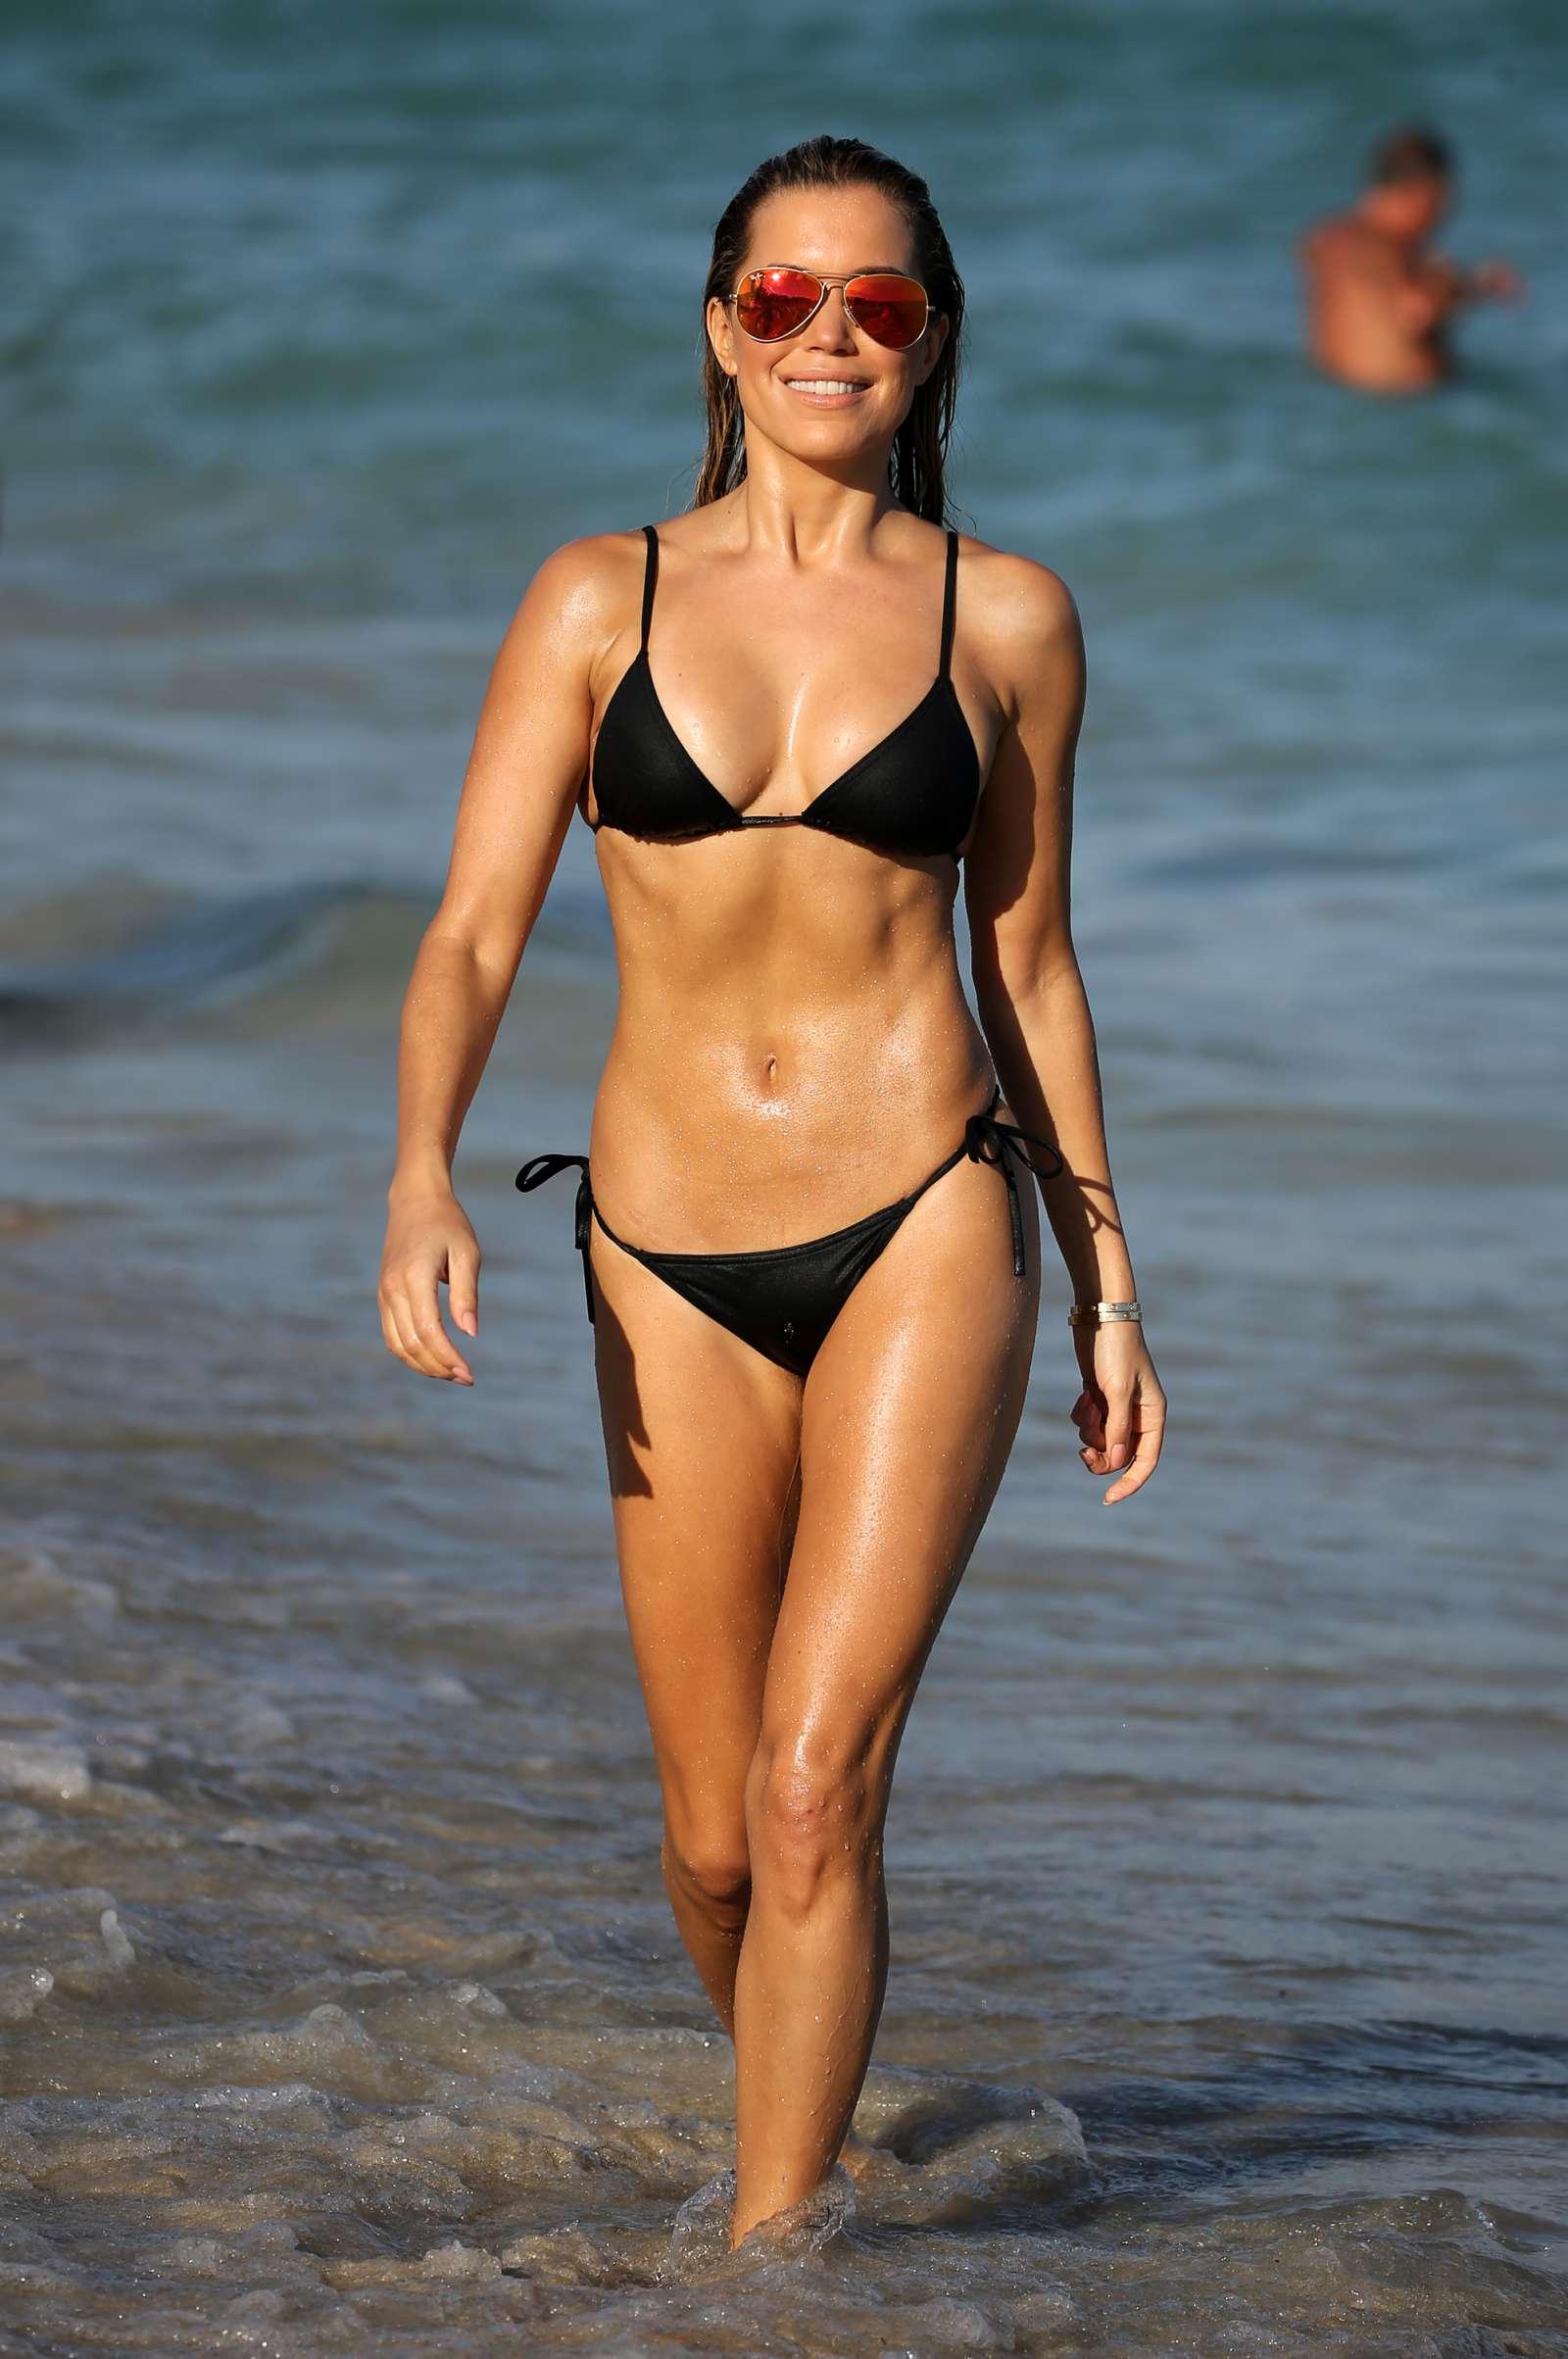 Sylvie Meis 2017 : Sylvie Meis in Black Bikini 2017 -24